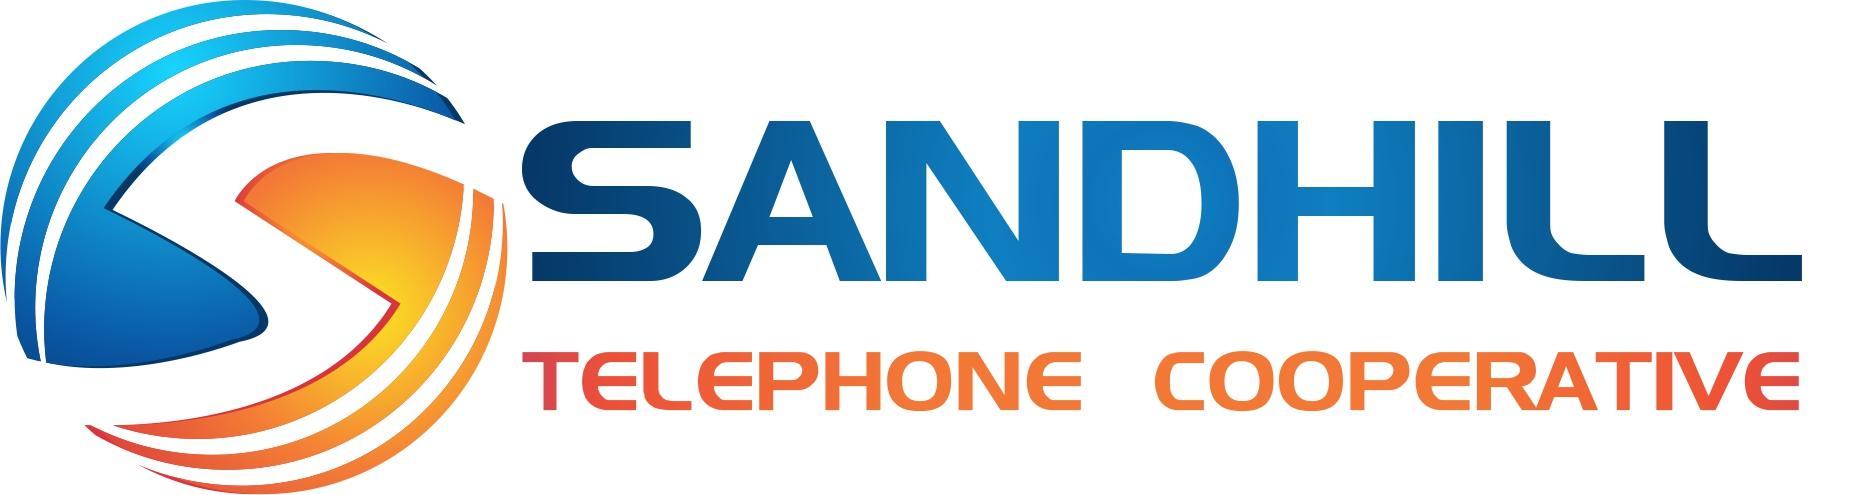 Sandhill Telephone Cooperative logo